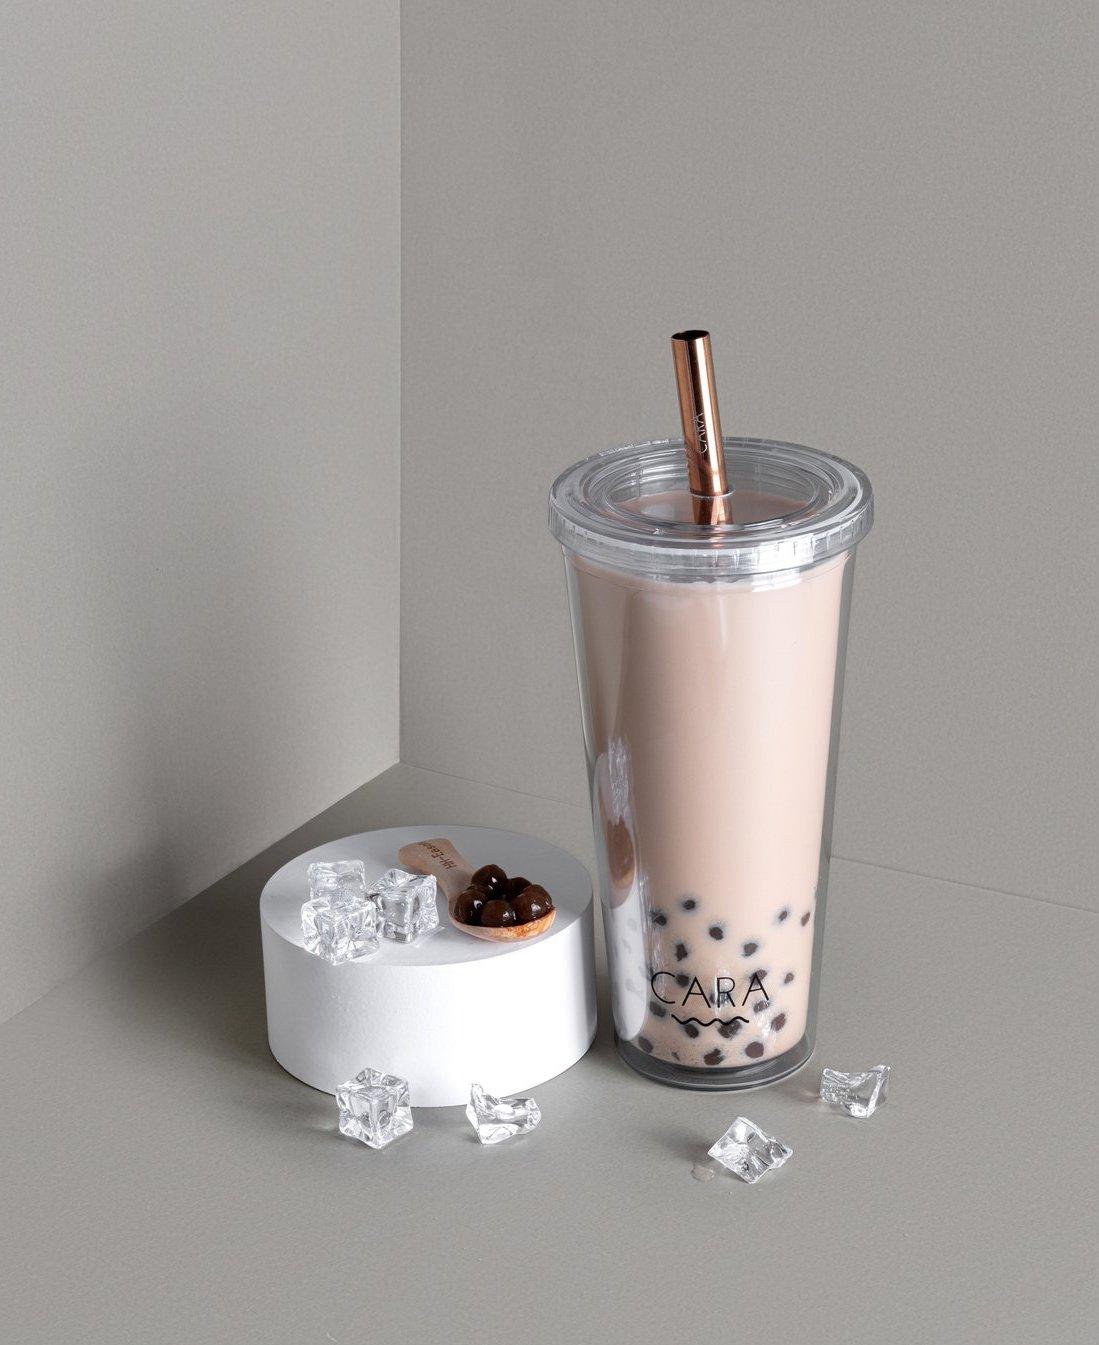 cara bubble tea tumbler